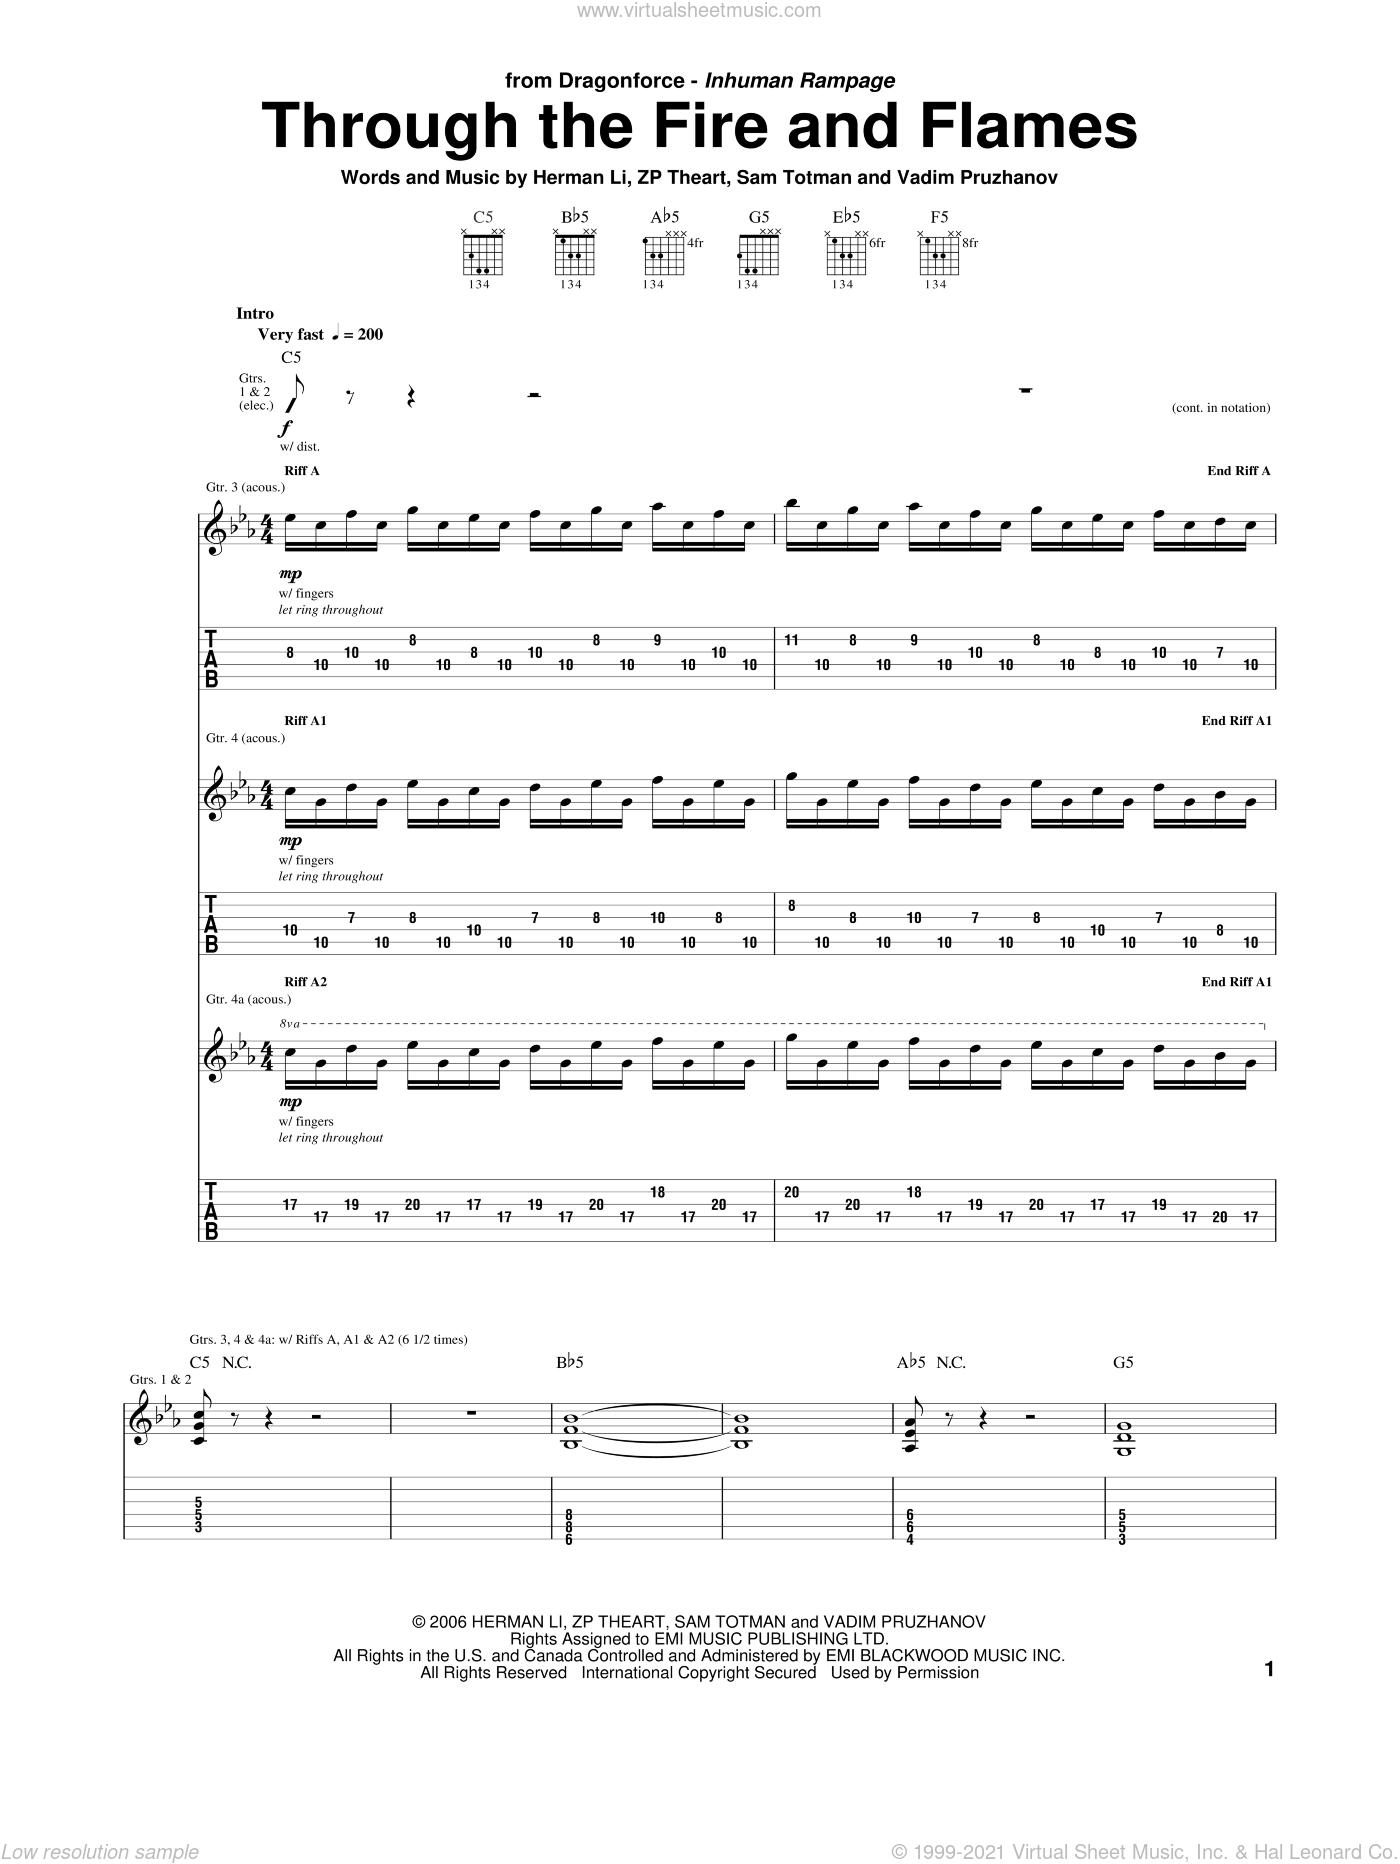 Through The Fire And Flames sheet music for guitar (tablature) by Dragonforce, Herman Li, Sam Totman, Vadim Pruzhanov and ZP Theart, intermediate skill level